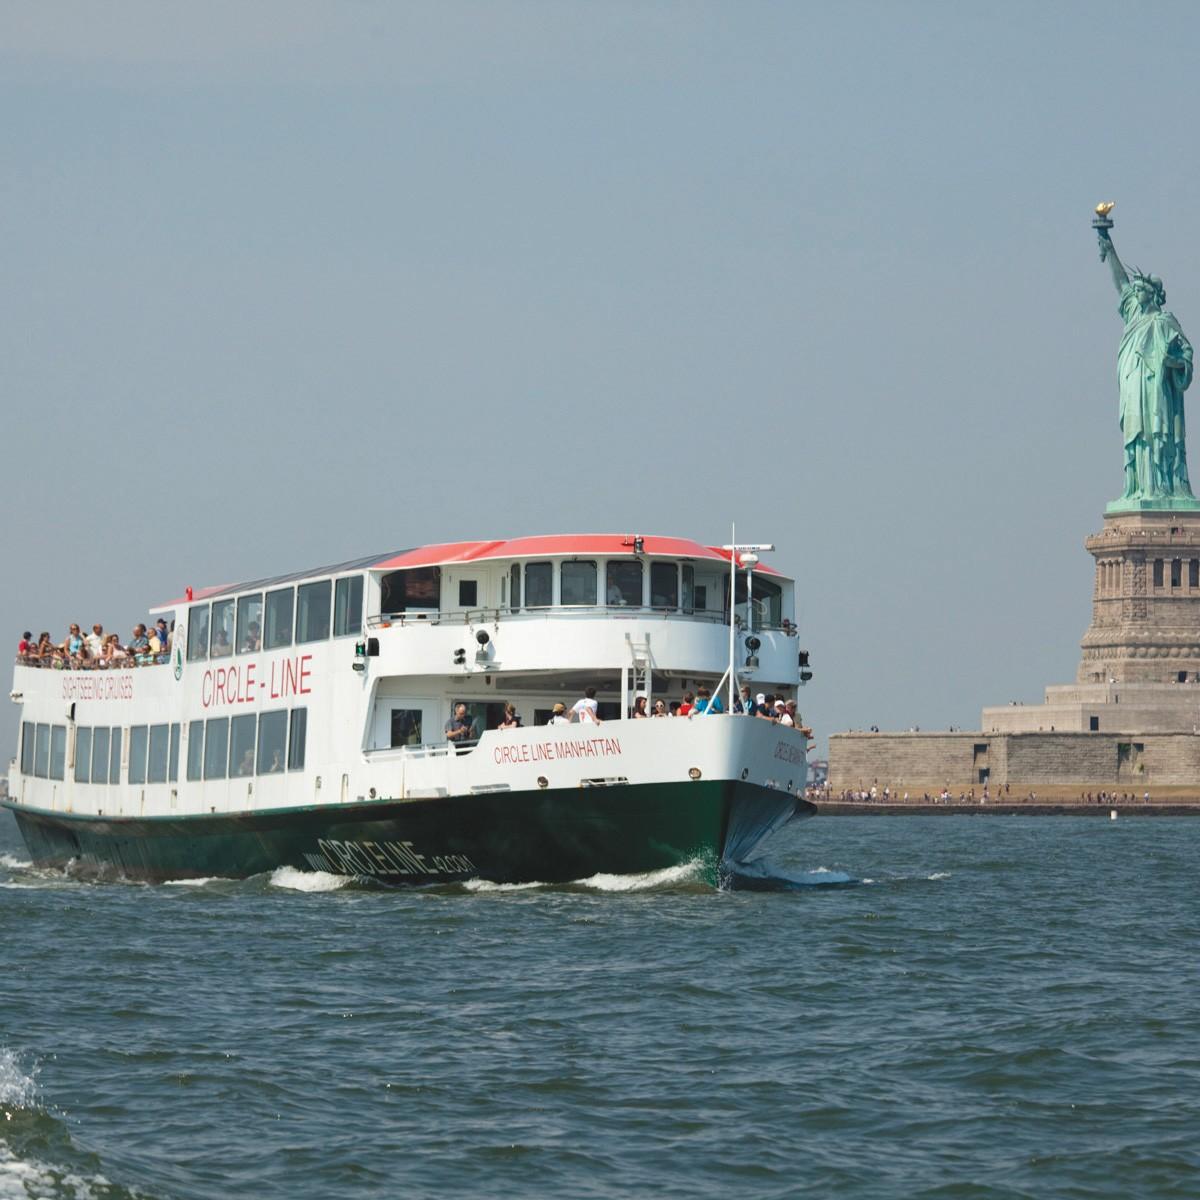 Landmark Cruise by Circle Line